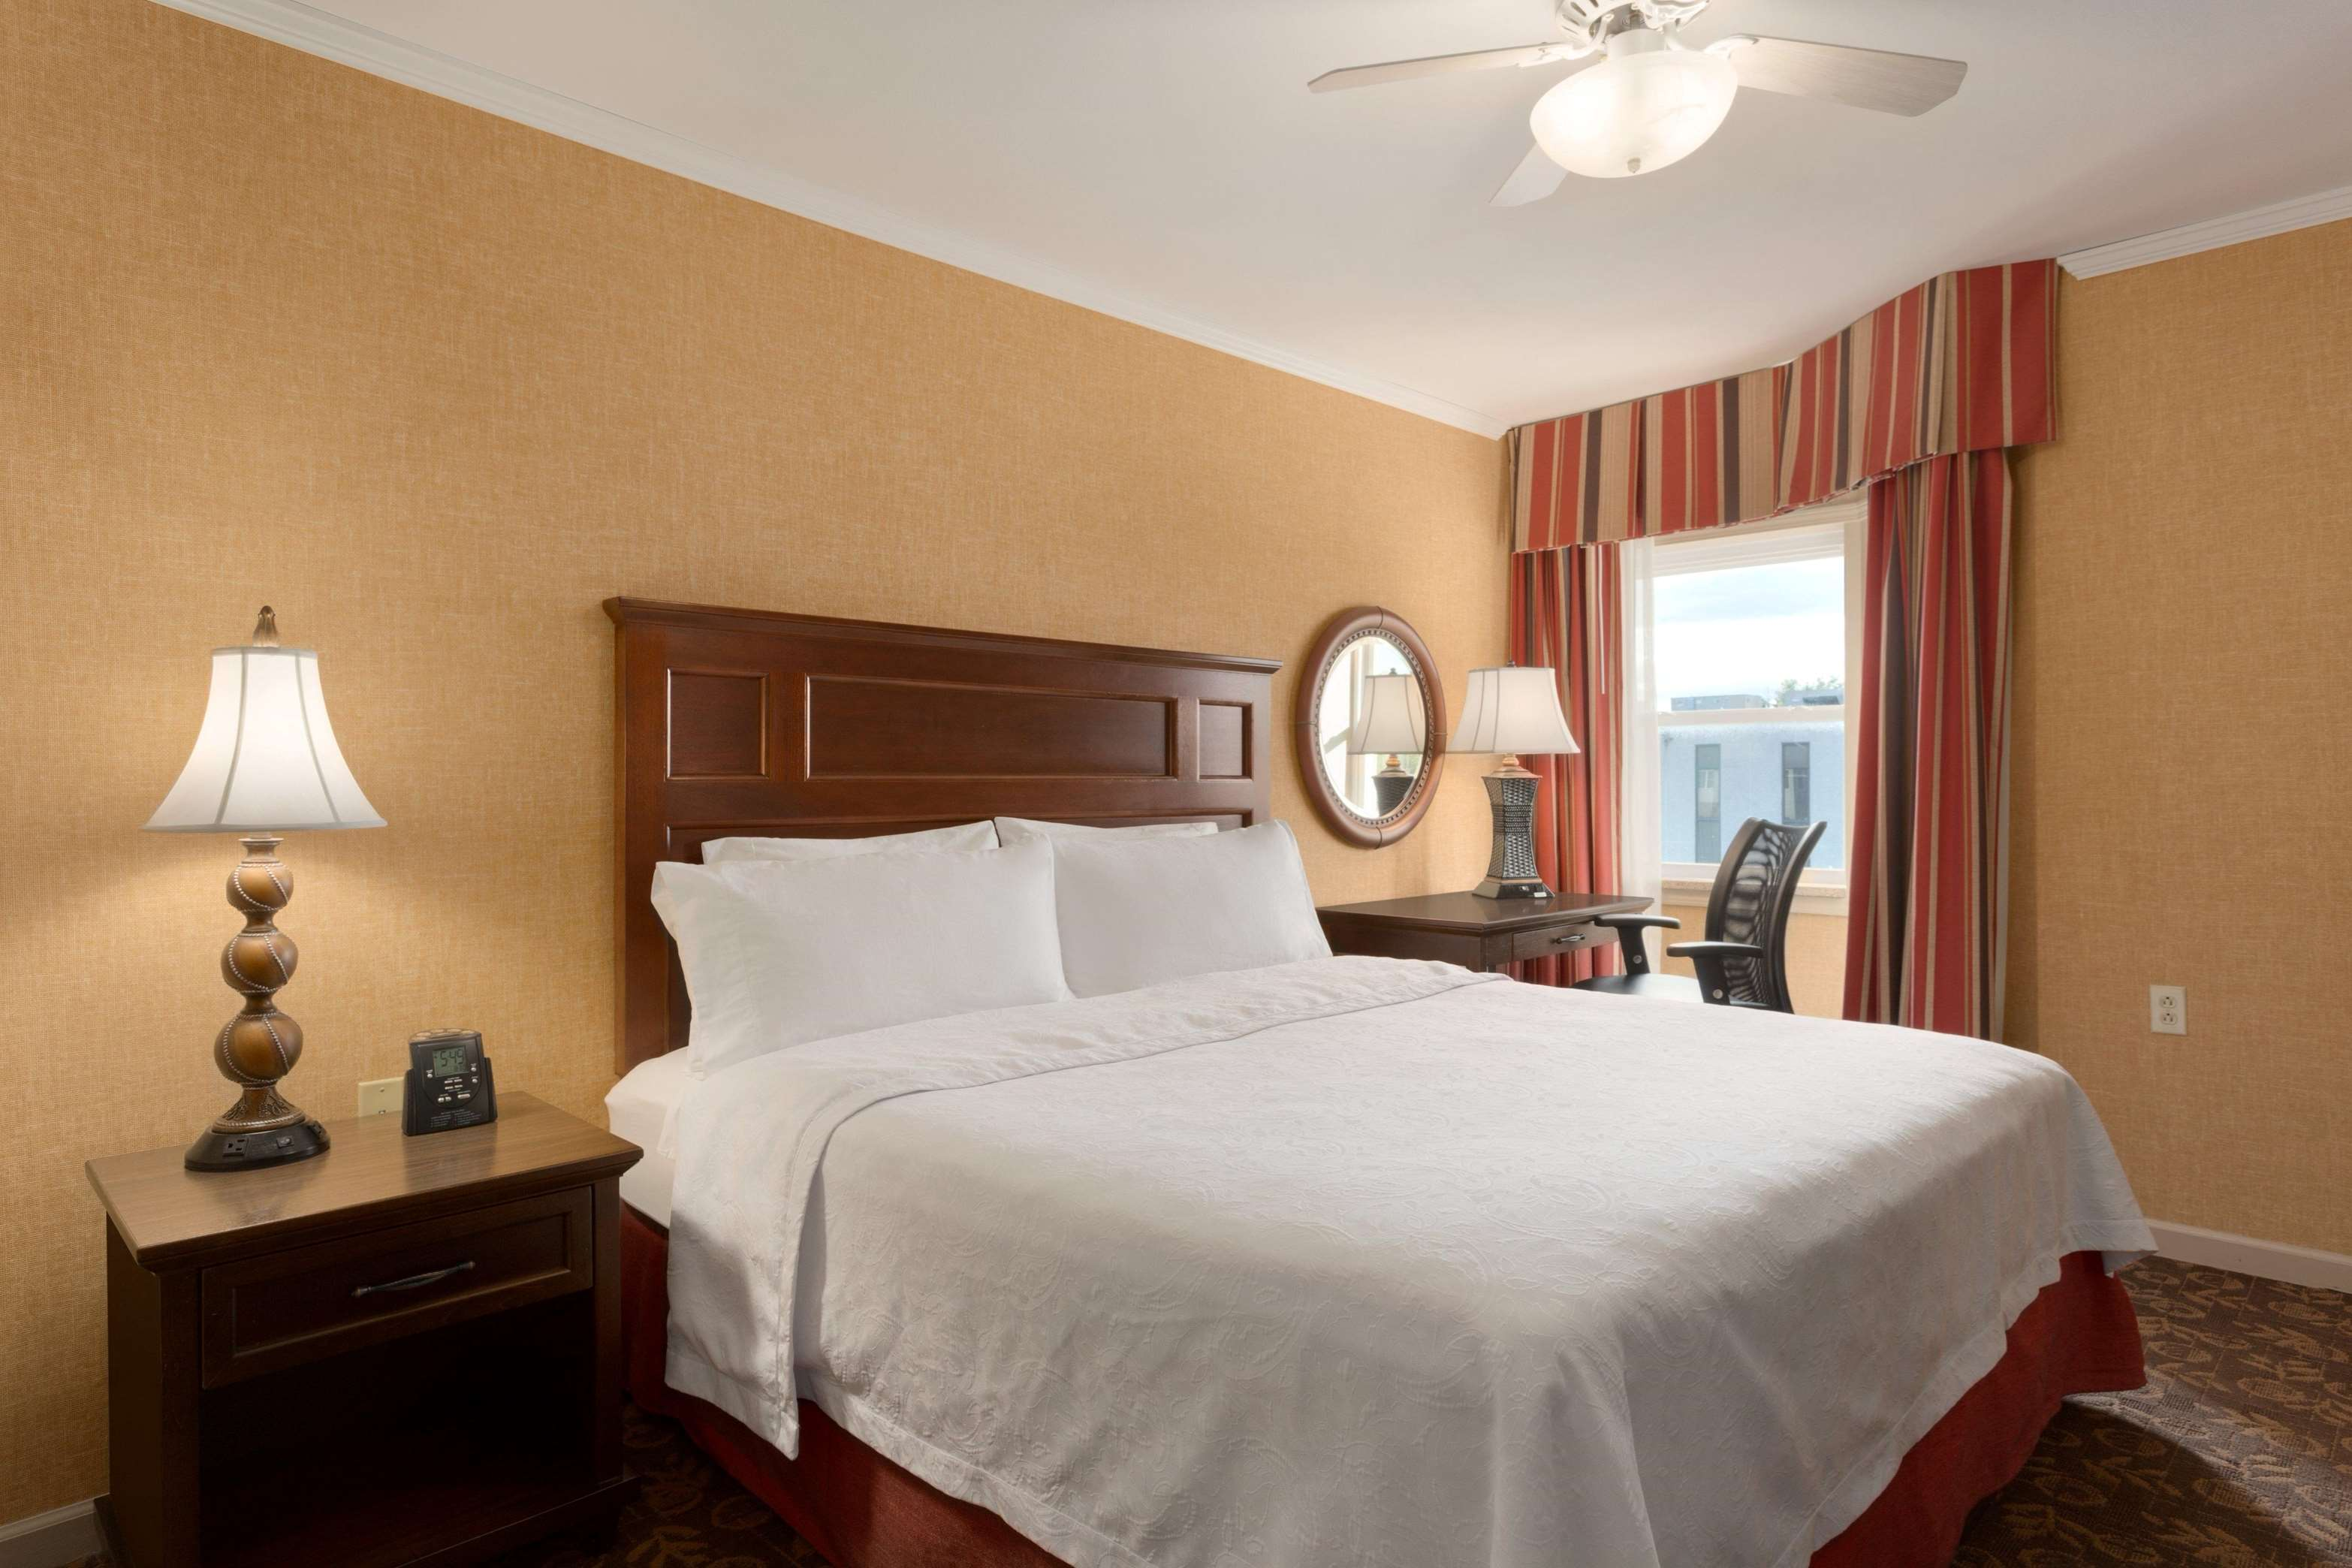 Homewood Suites by Hilton Syracuse/Liverpool image 18